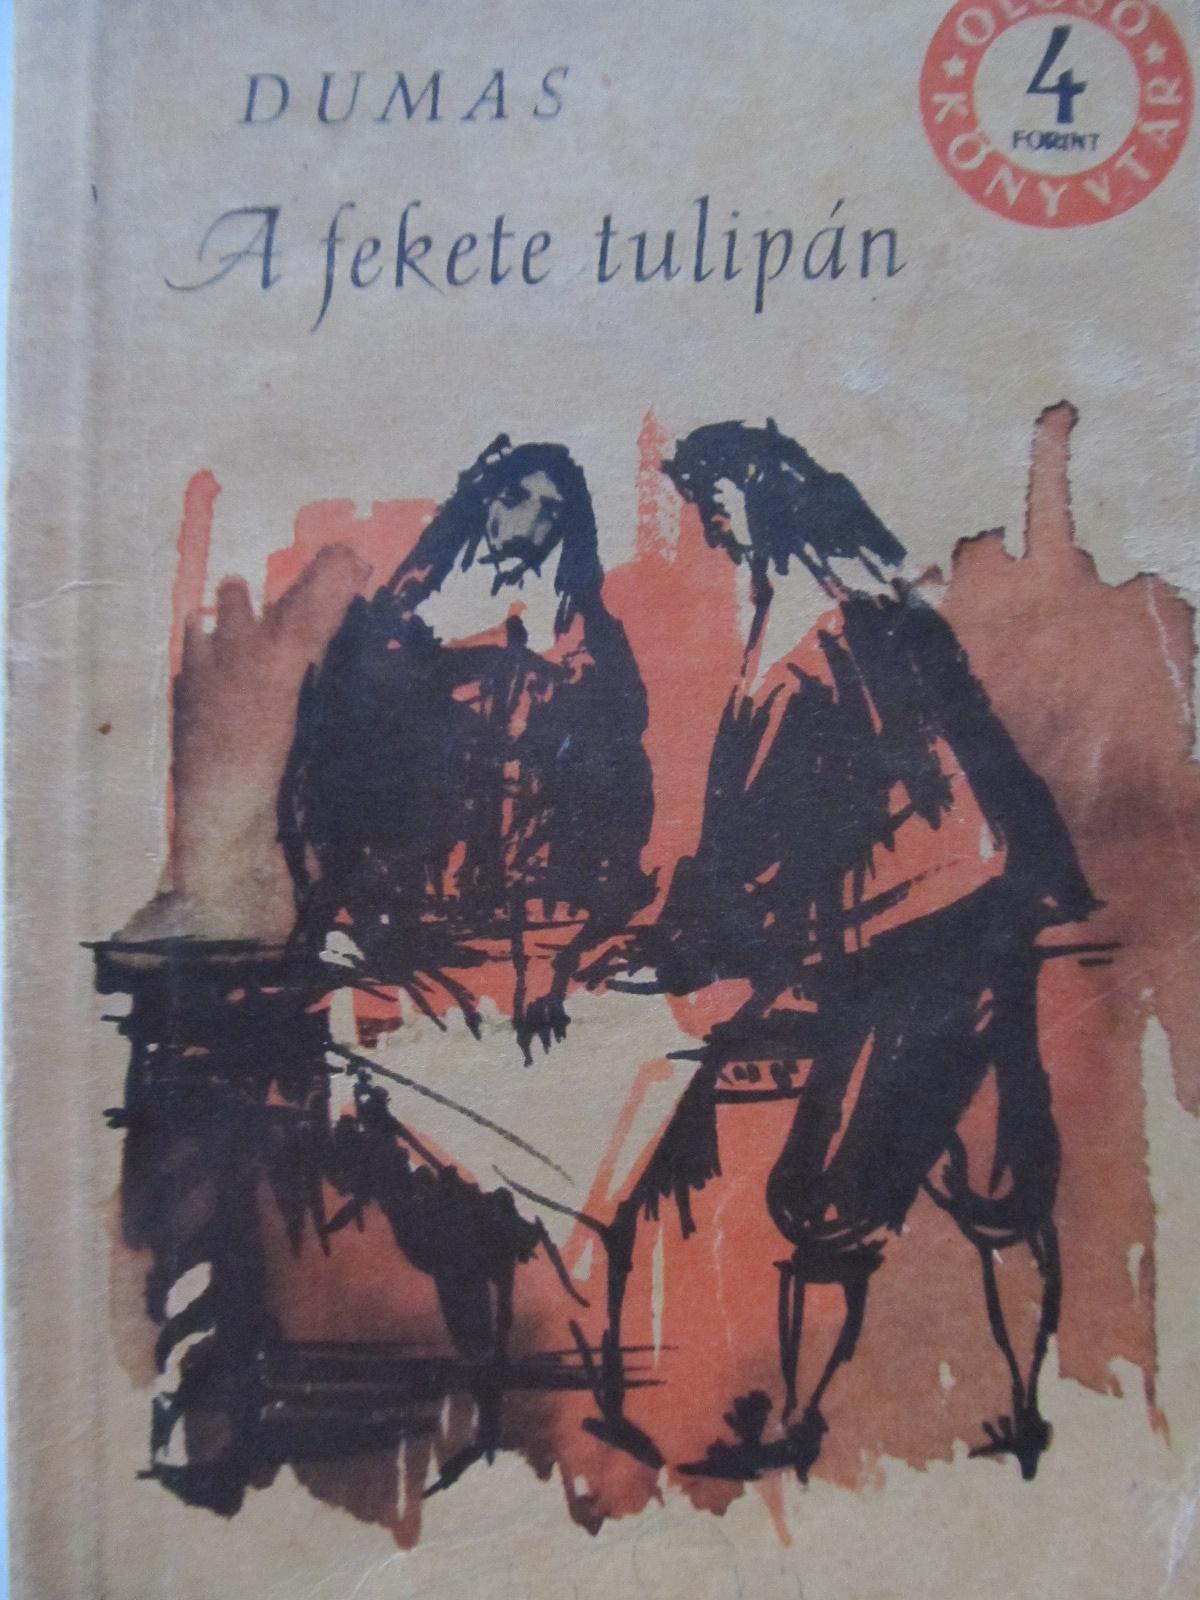 A fekete tulipan - Al. Dumas | Detalii carte